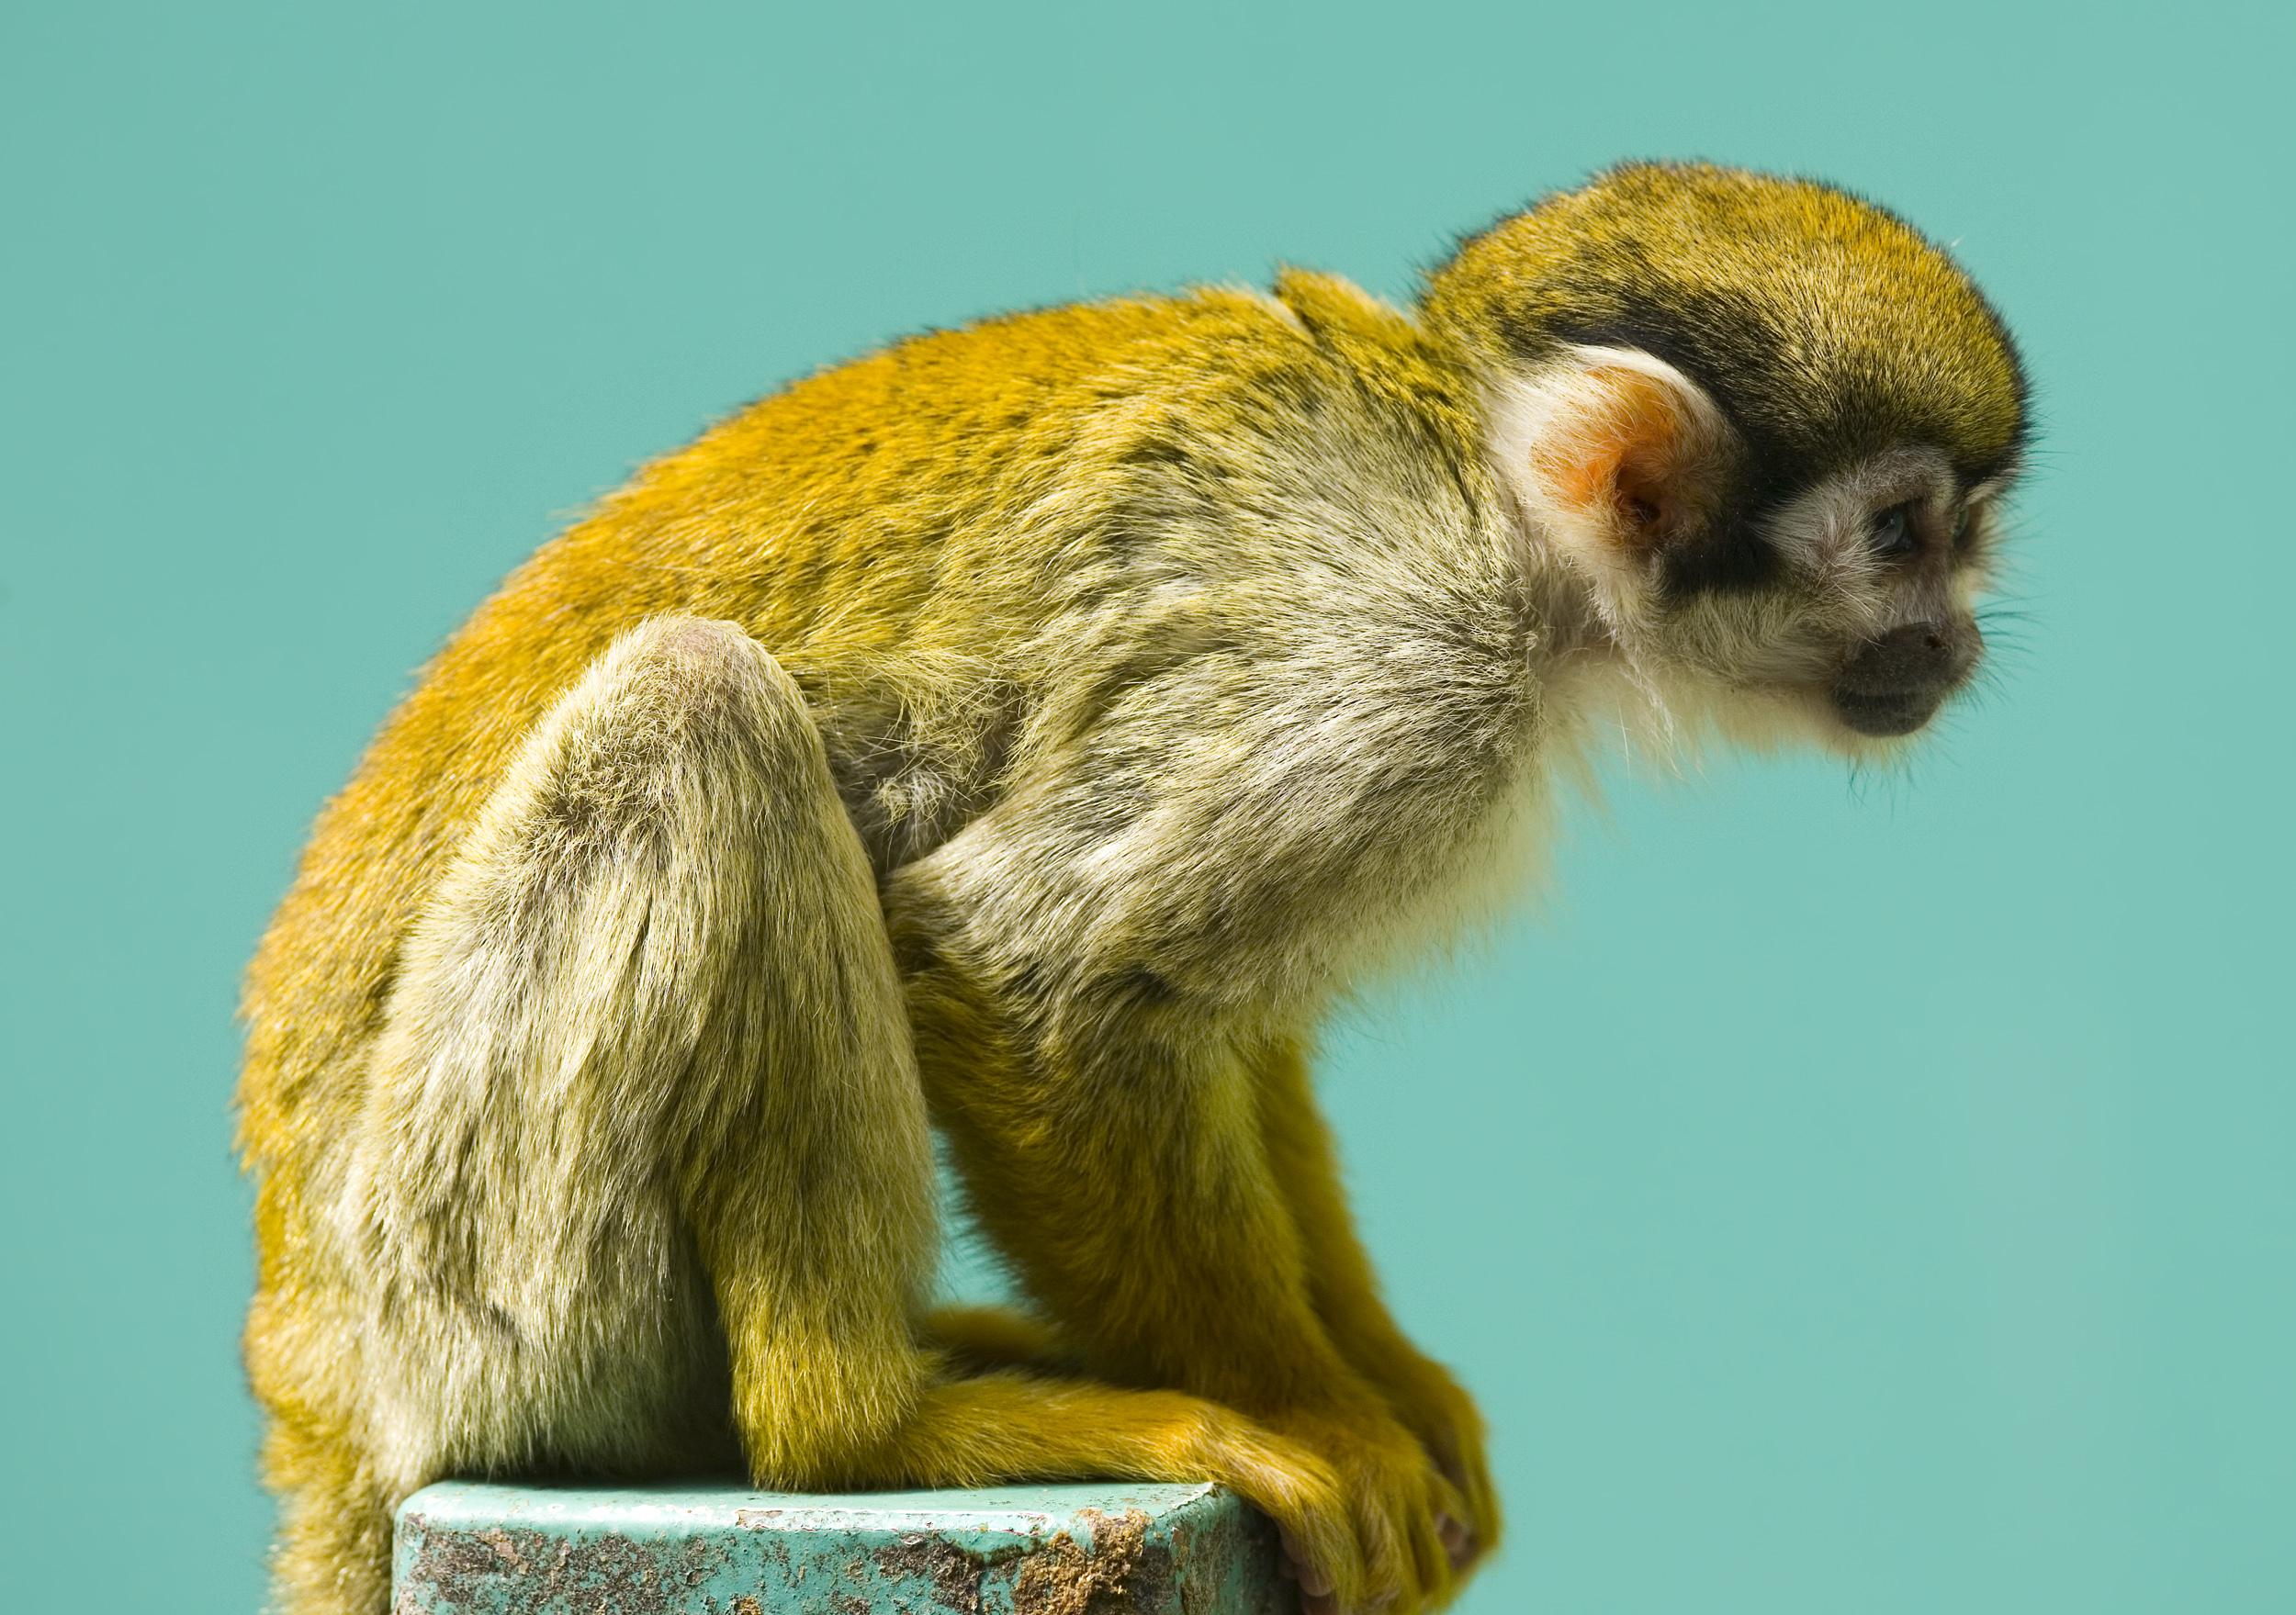 filesquirrel monkey fujijpg wikipedia